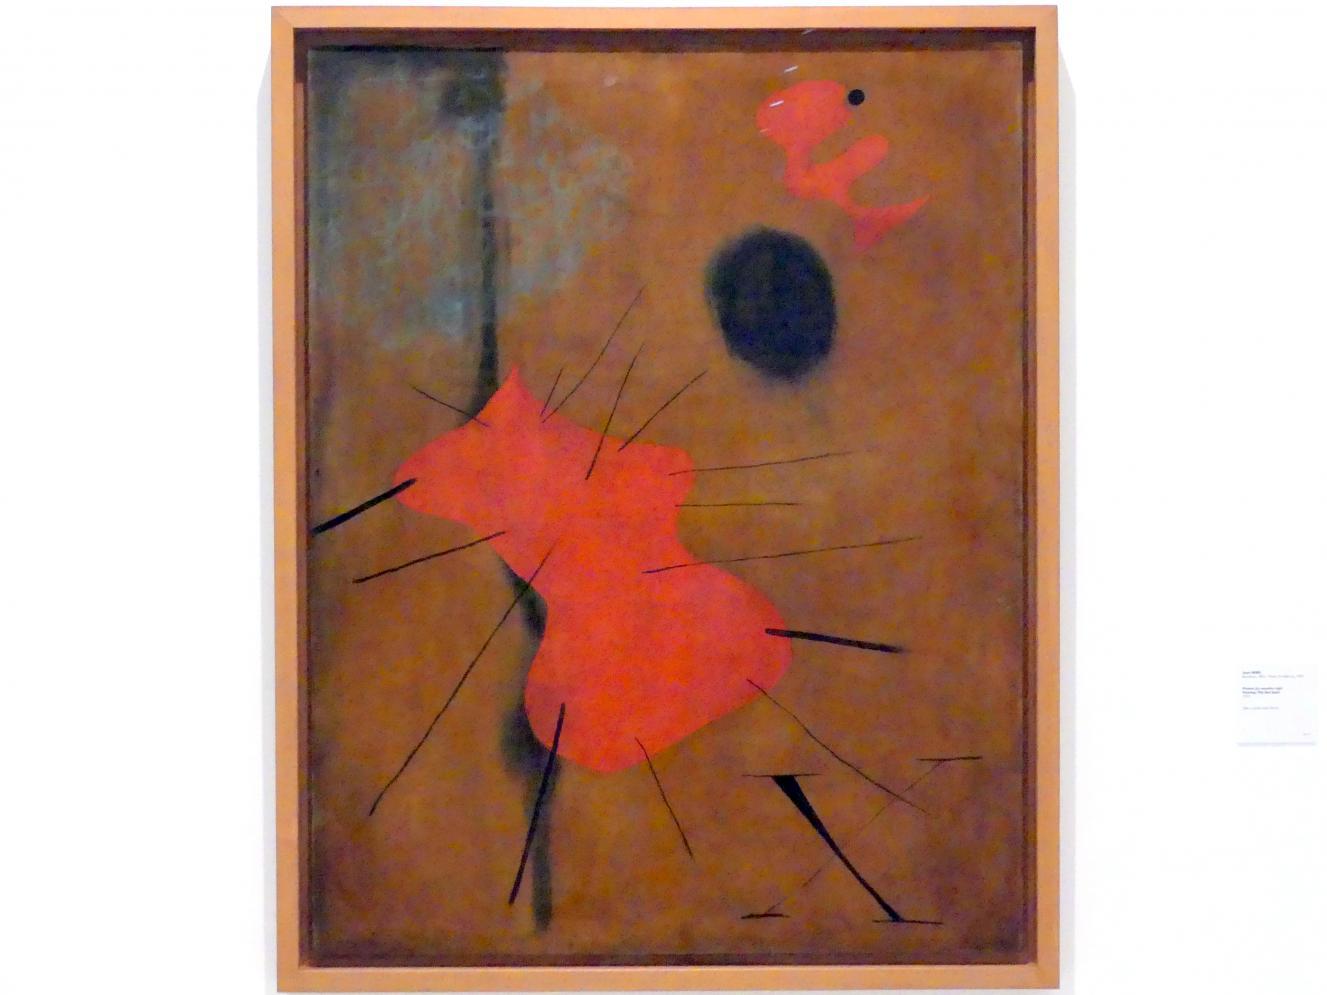 Joan Miró: Malerei (Roter Klecks), 1925